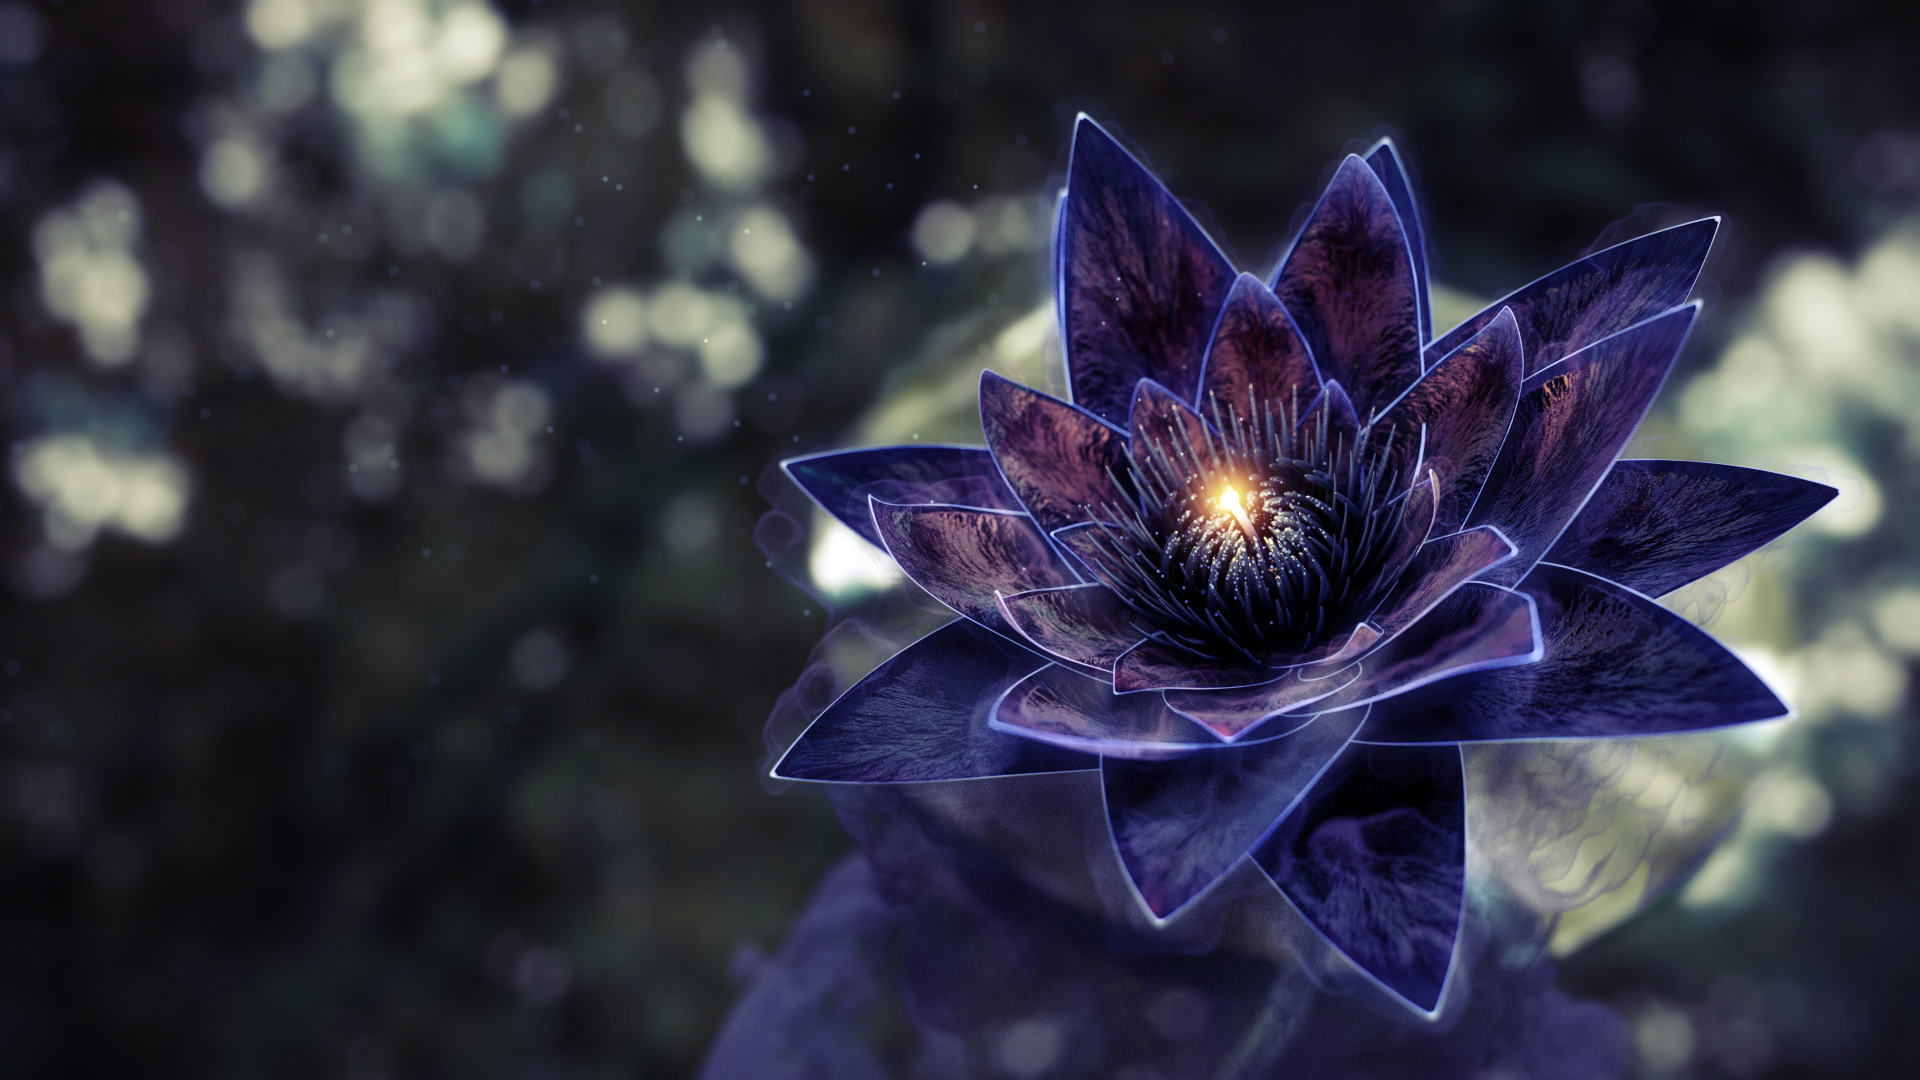 Black Lotus - Black Lotus Flower , HD Wallpaper & Backgrounds